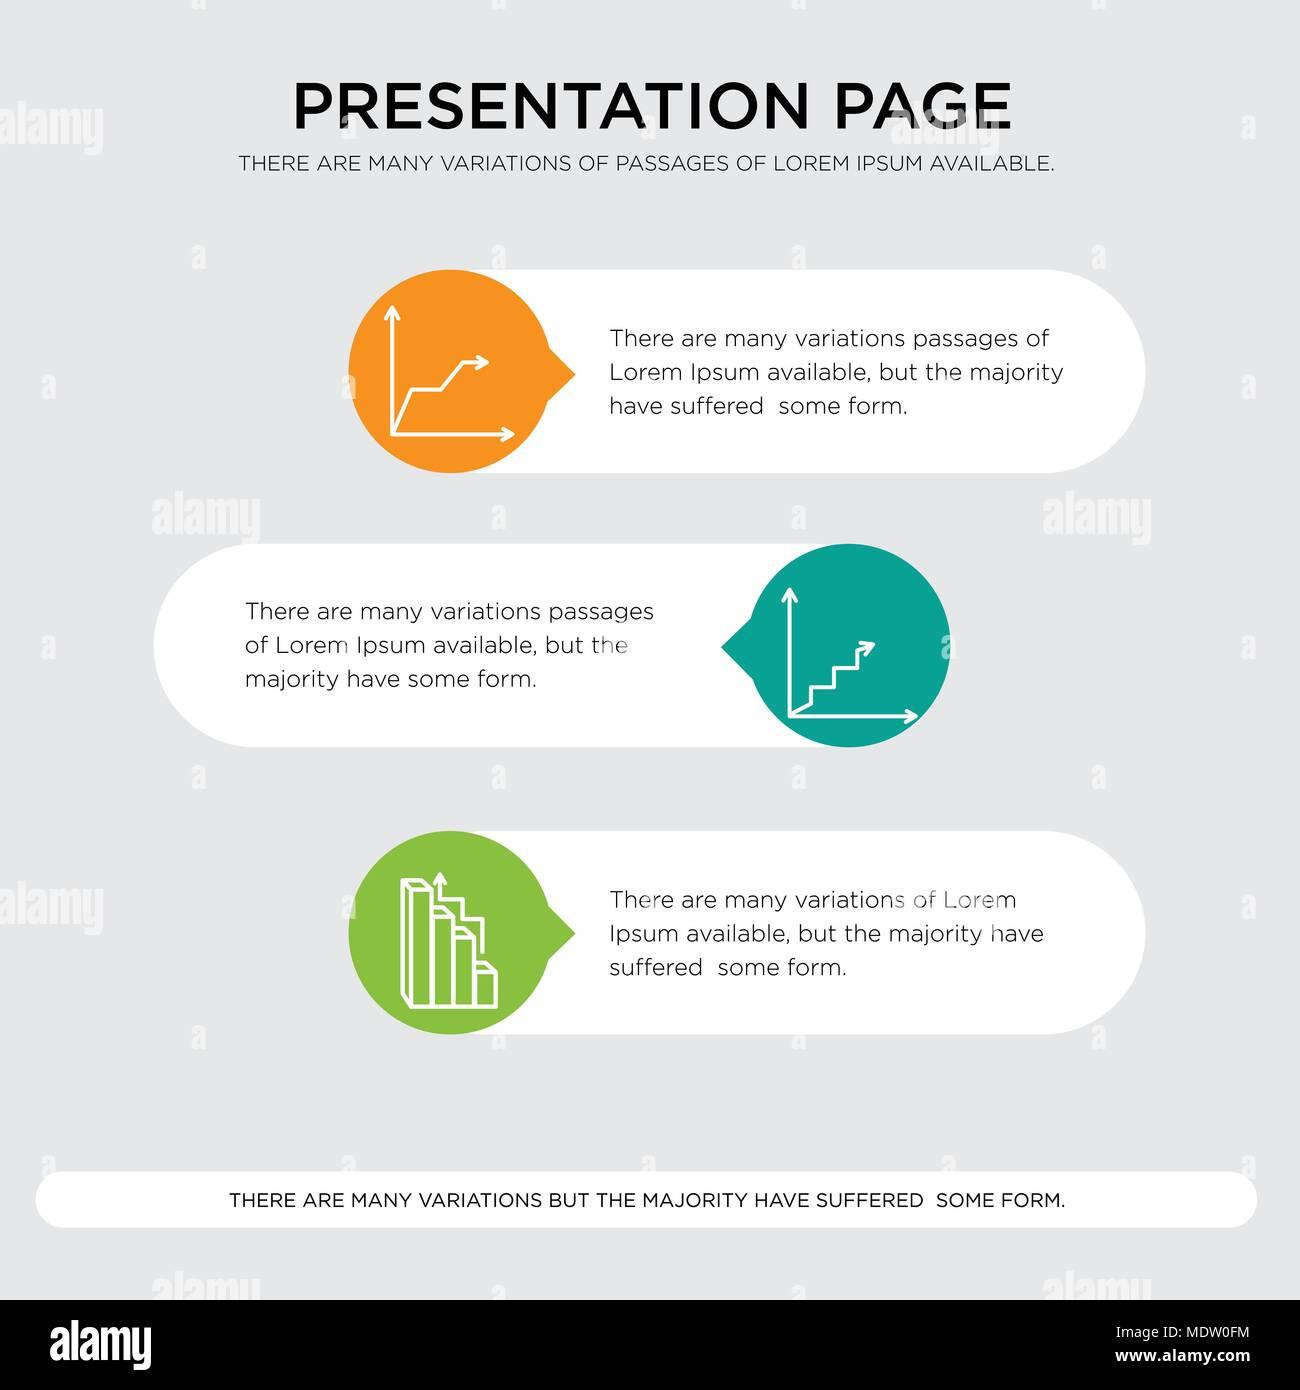 targeting data analytics ascending triangular pyramid presentation